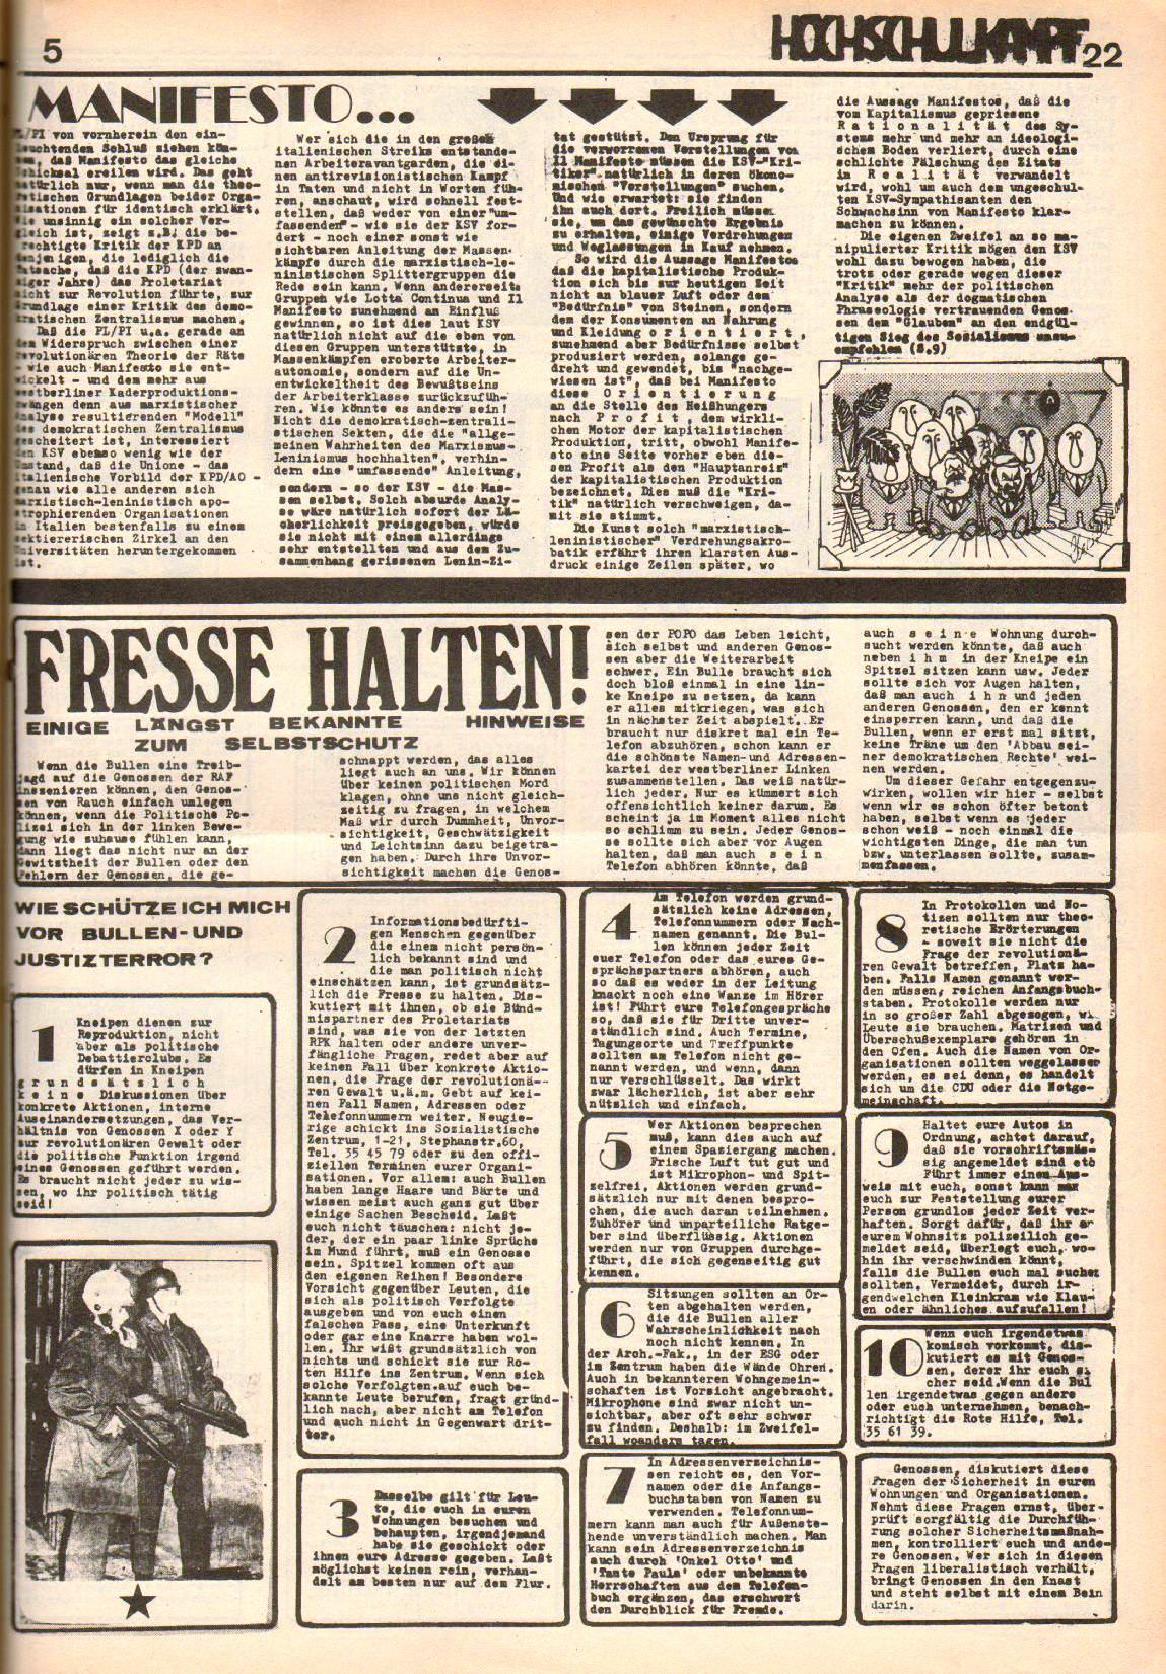 Berlin_Hochschulkampf_1971_22_05